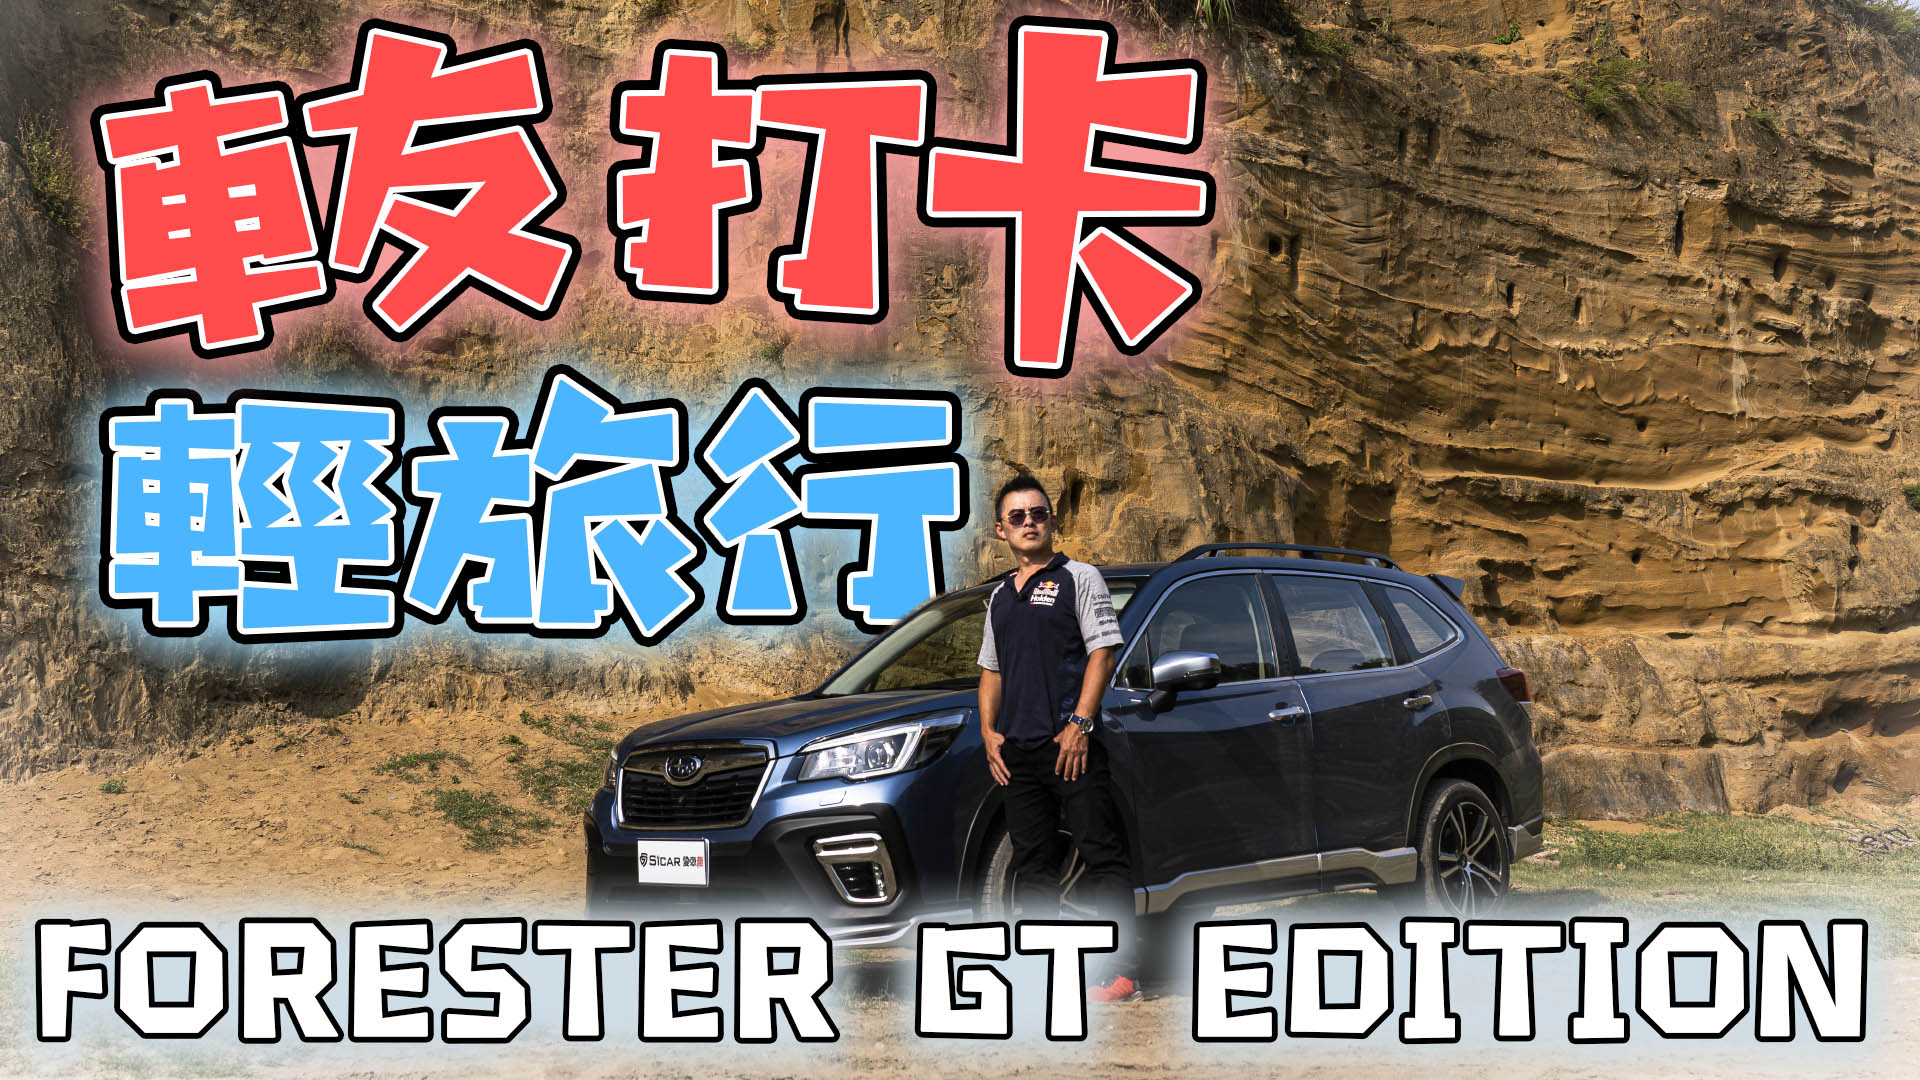 【特別企劃】來趟輕旅行!神秘打卡景點!!Ft.FORESTER GT Edition